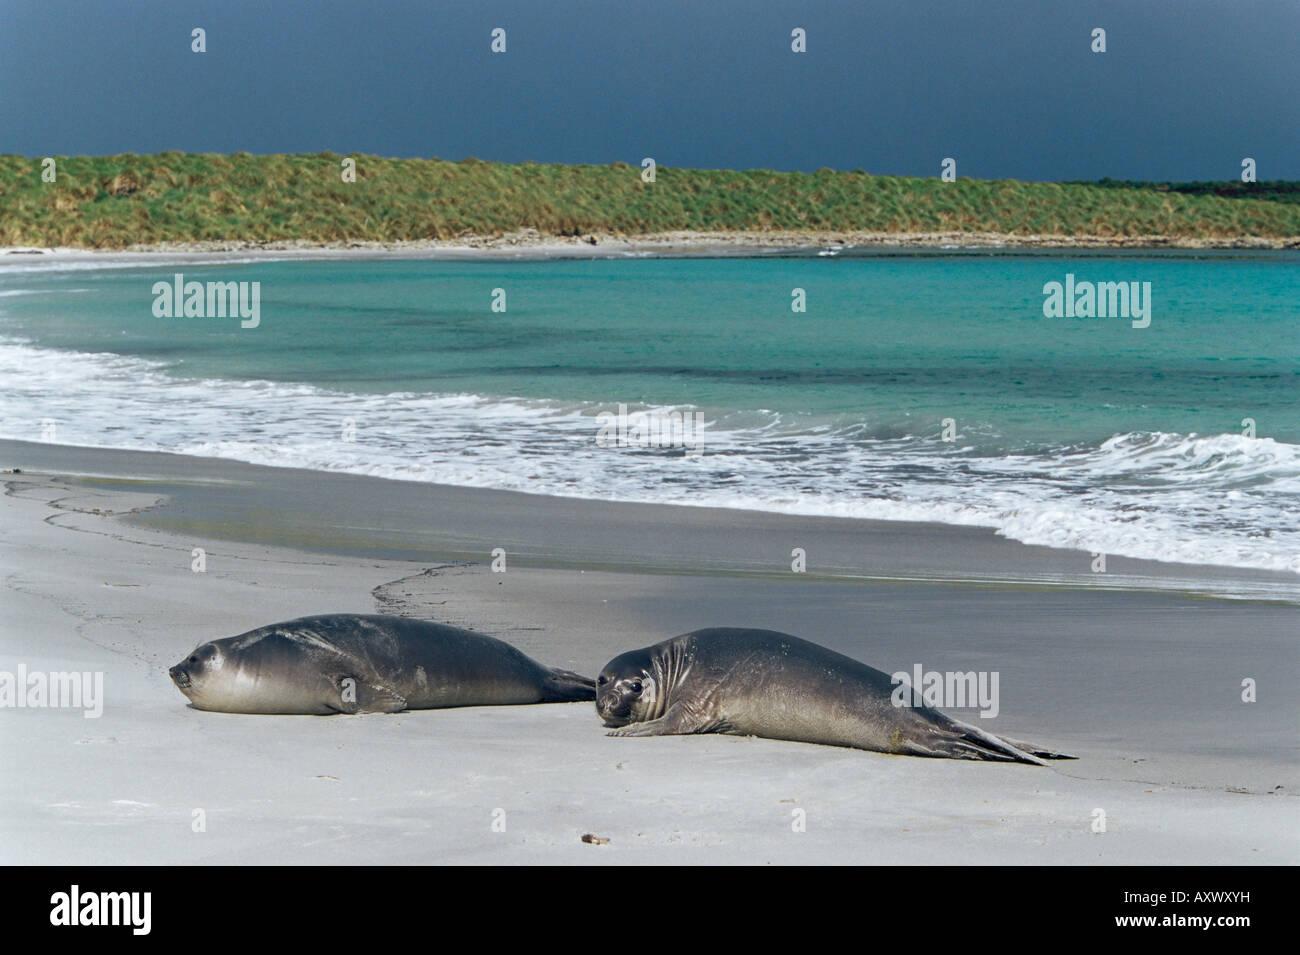 Elephant seals relaxing on the beach, Sea Lion Island, Falkland Islands, South Atlantic, South America - Stock Image